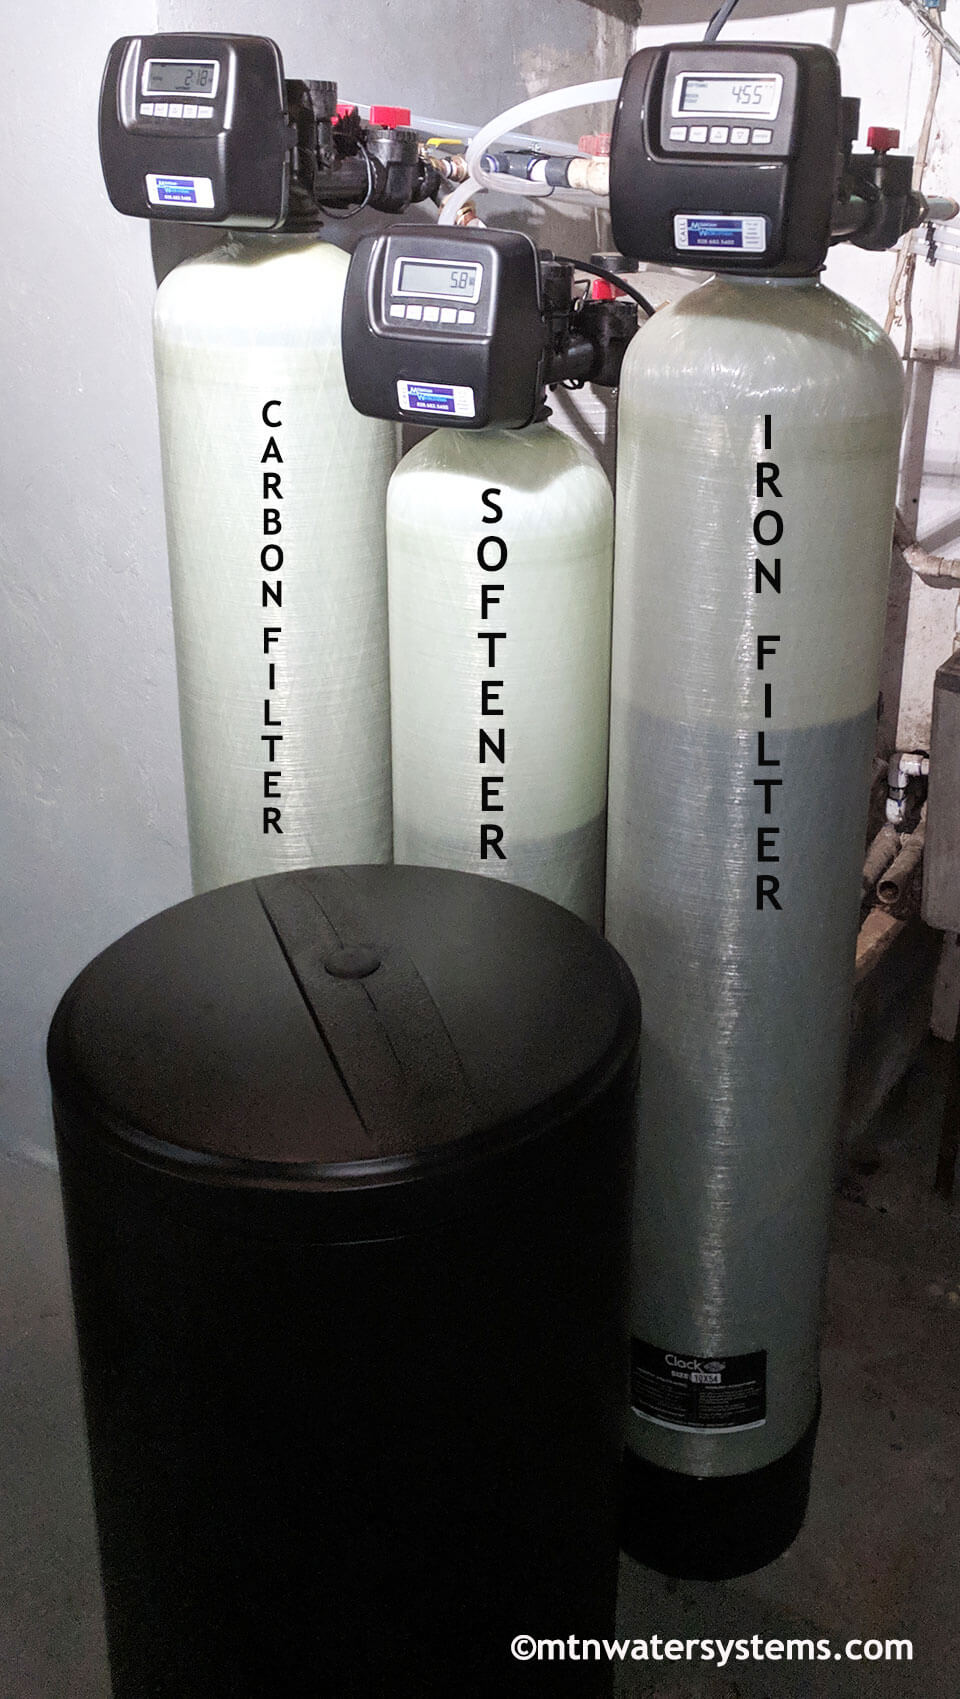 Candler Customer Upgrades Water Filtration System